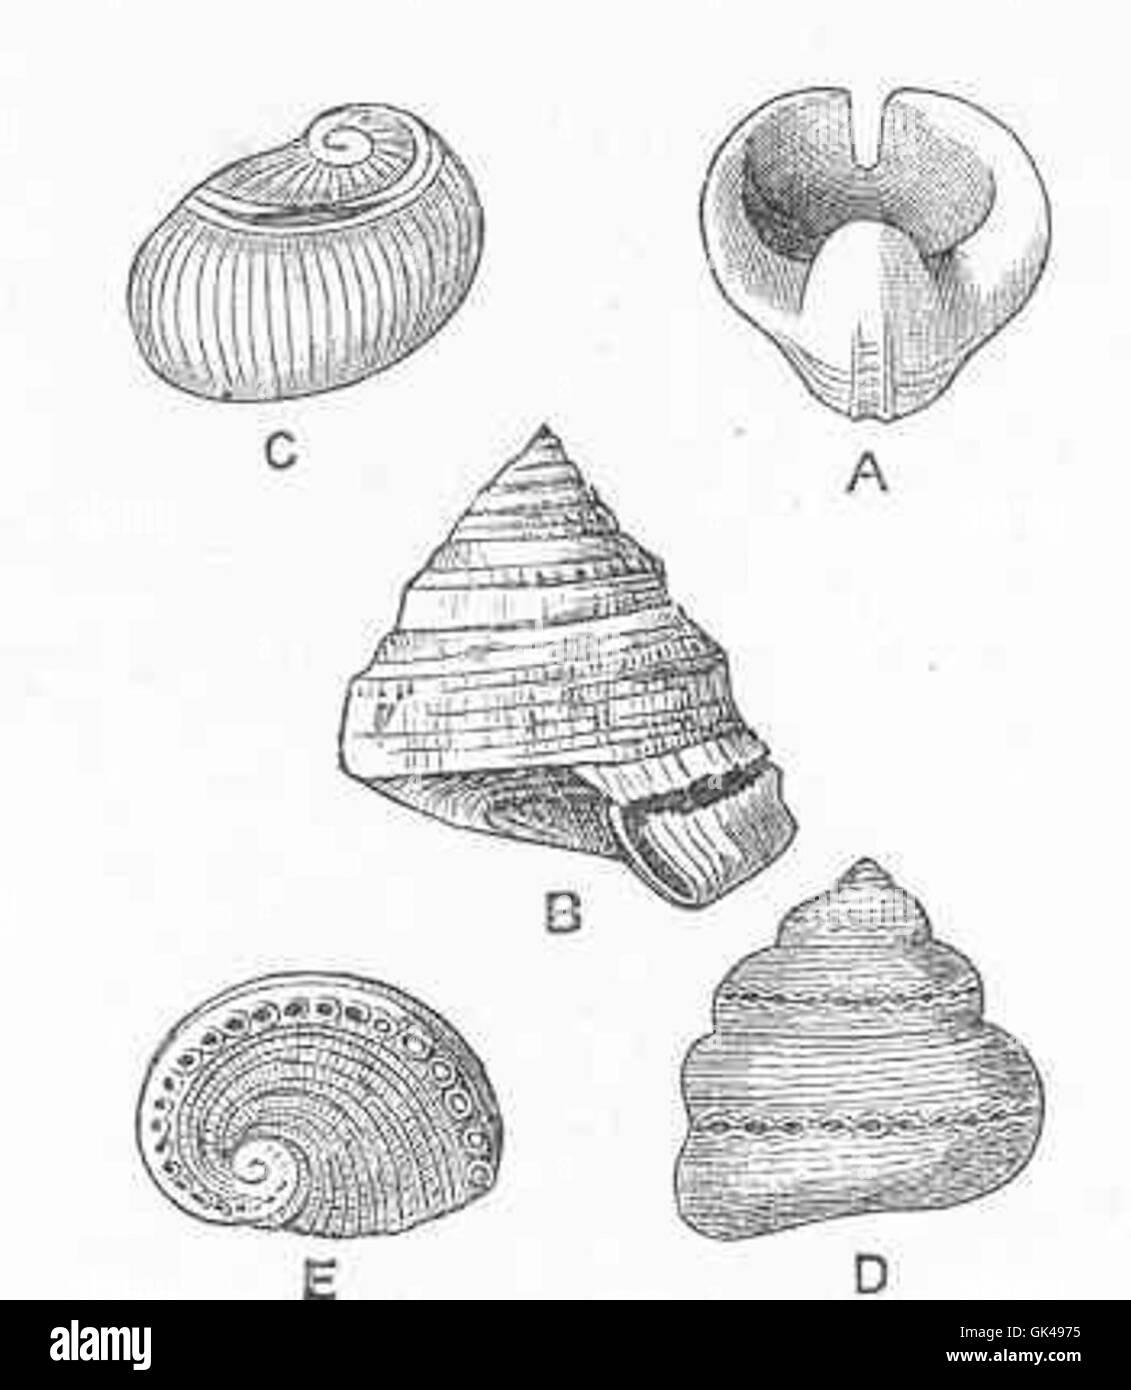 48684 Slit in A, Bellrophon; B, Pleurotomaria; C, Schismope; D, Polytremaria; E, Haliotis - Stock Image